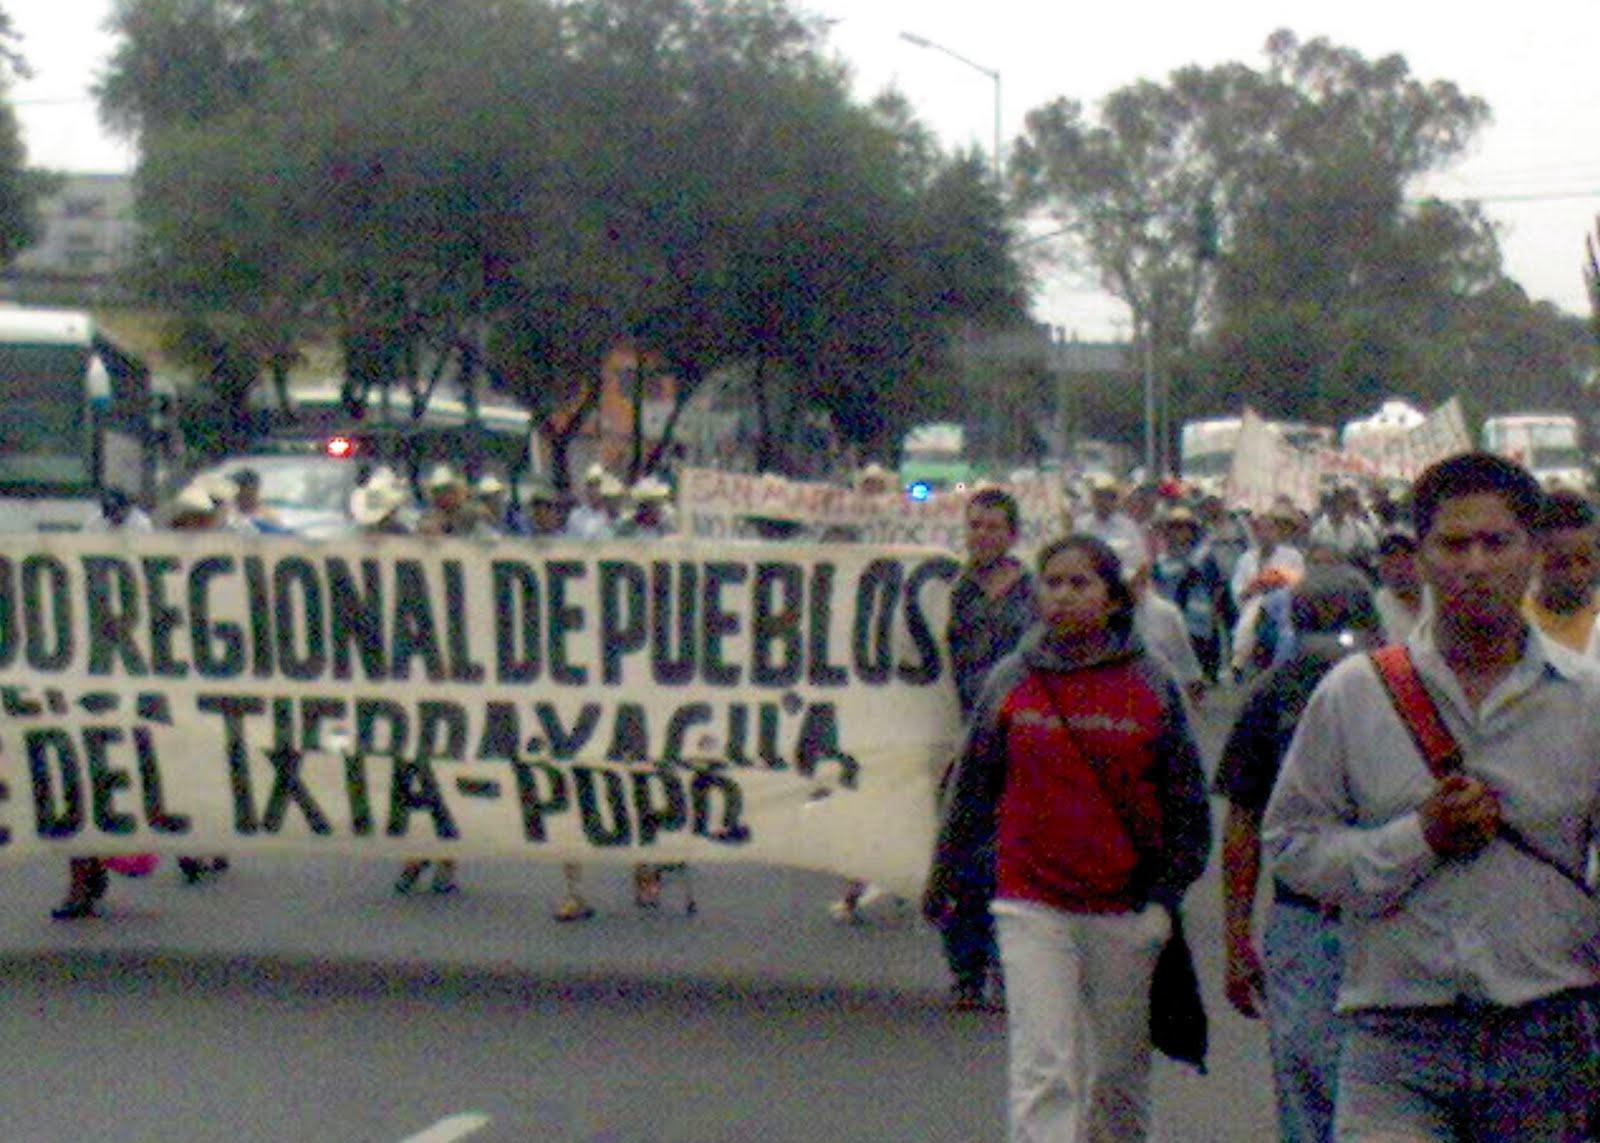 http://3.bp.blogspot.com/_Ak06j9PE4Gk/TCv9DIfFKII/AAAAAAAAAF0/abW59t5UgtI/s1600/marcha+frente+pueblos+pue+tlax+24+jun+2010+1.jpg